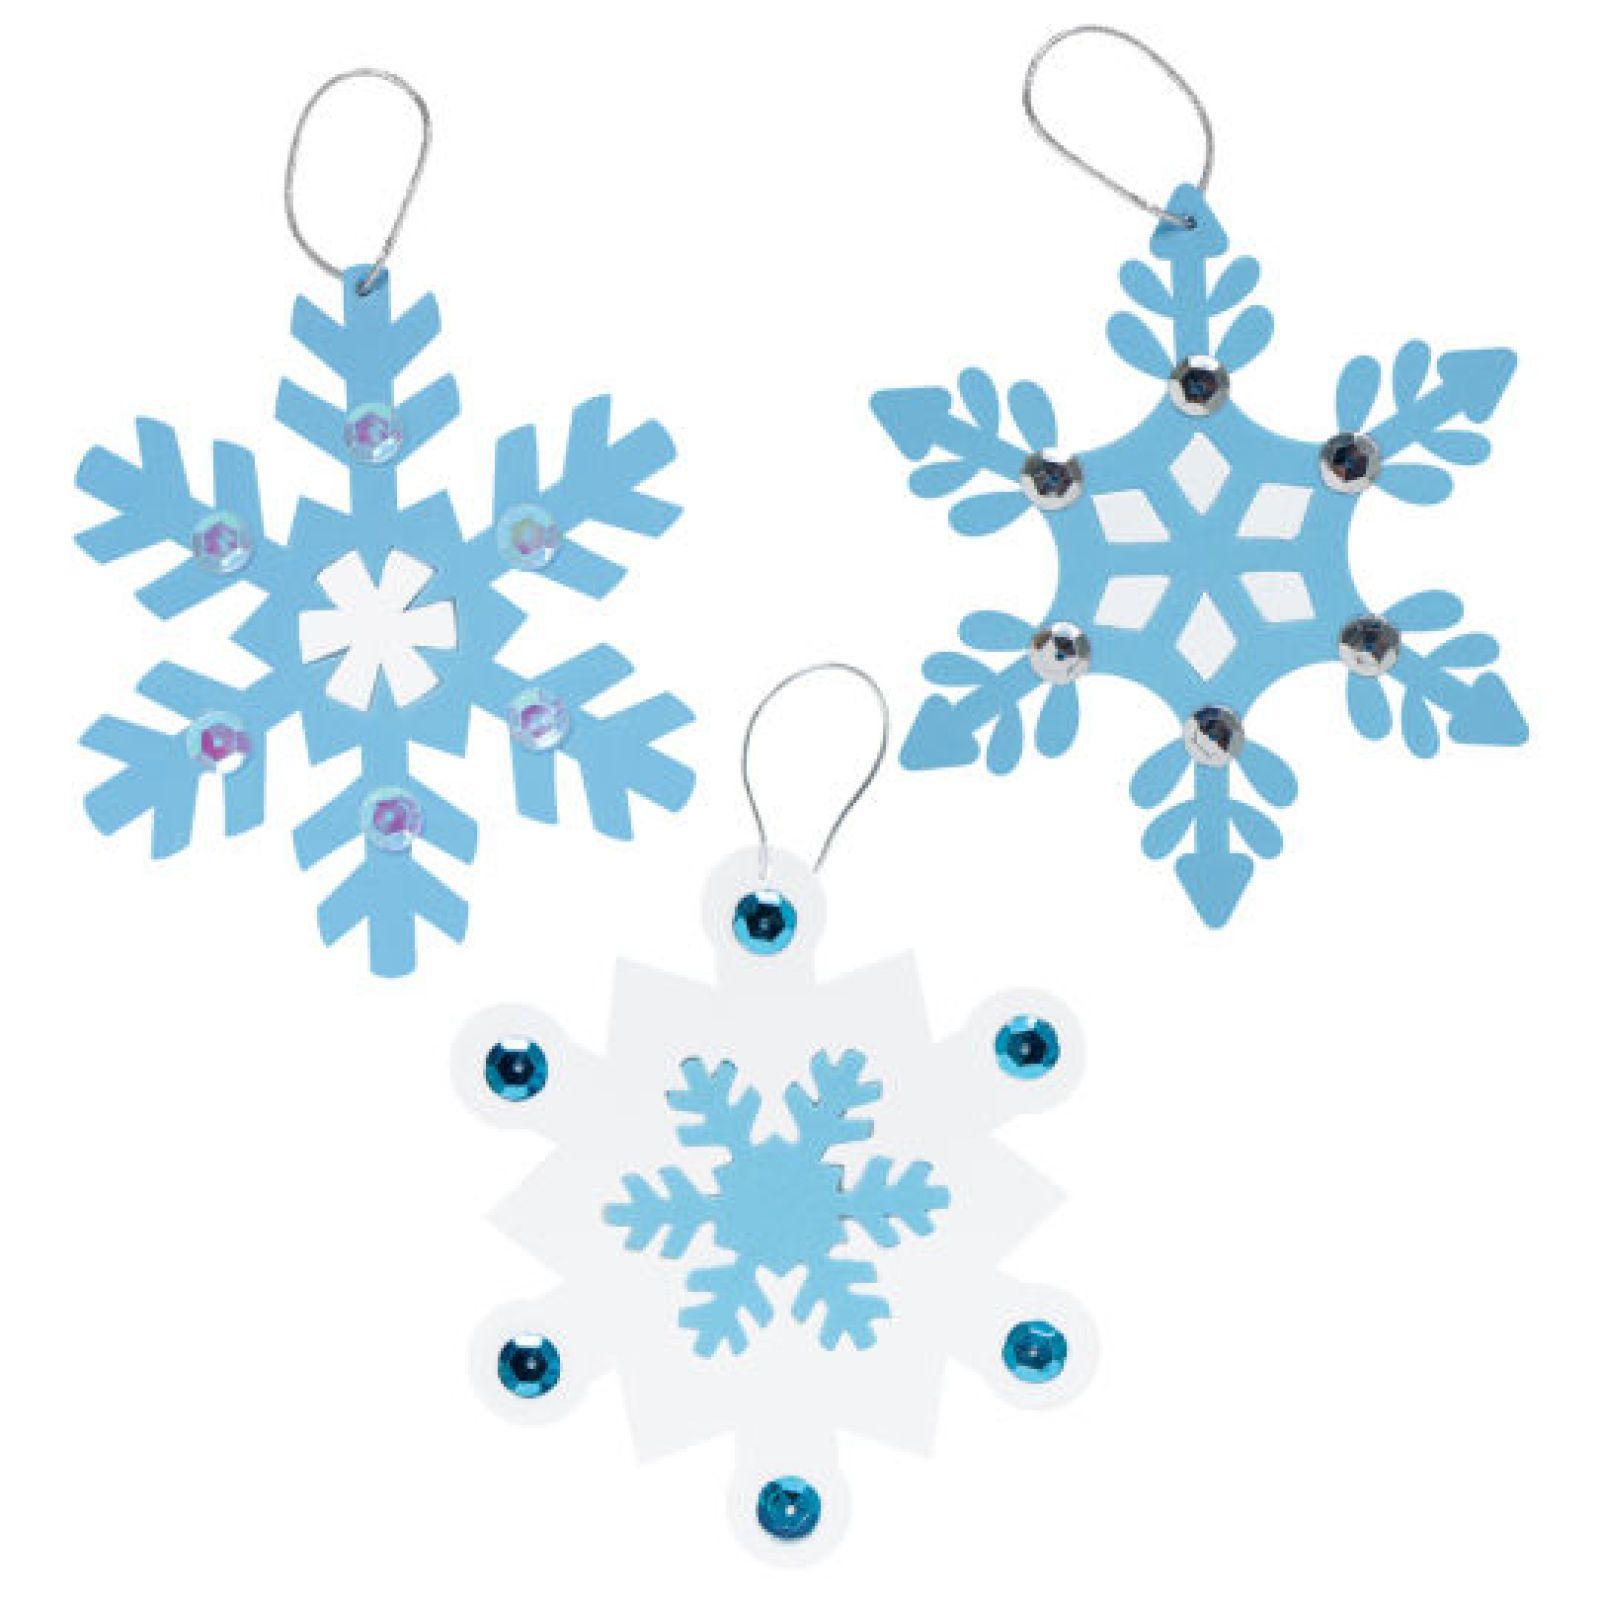 Snowflake christmas ornaments bulk - Creatology Holiday Snowflakes Foam Ornament Kit